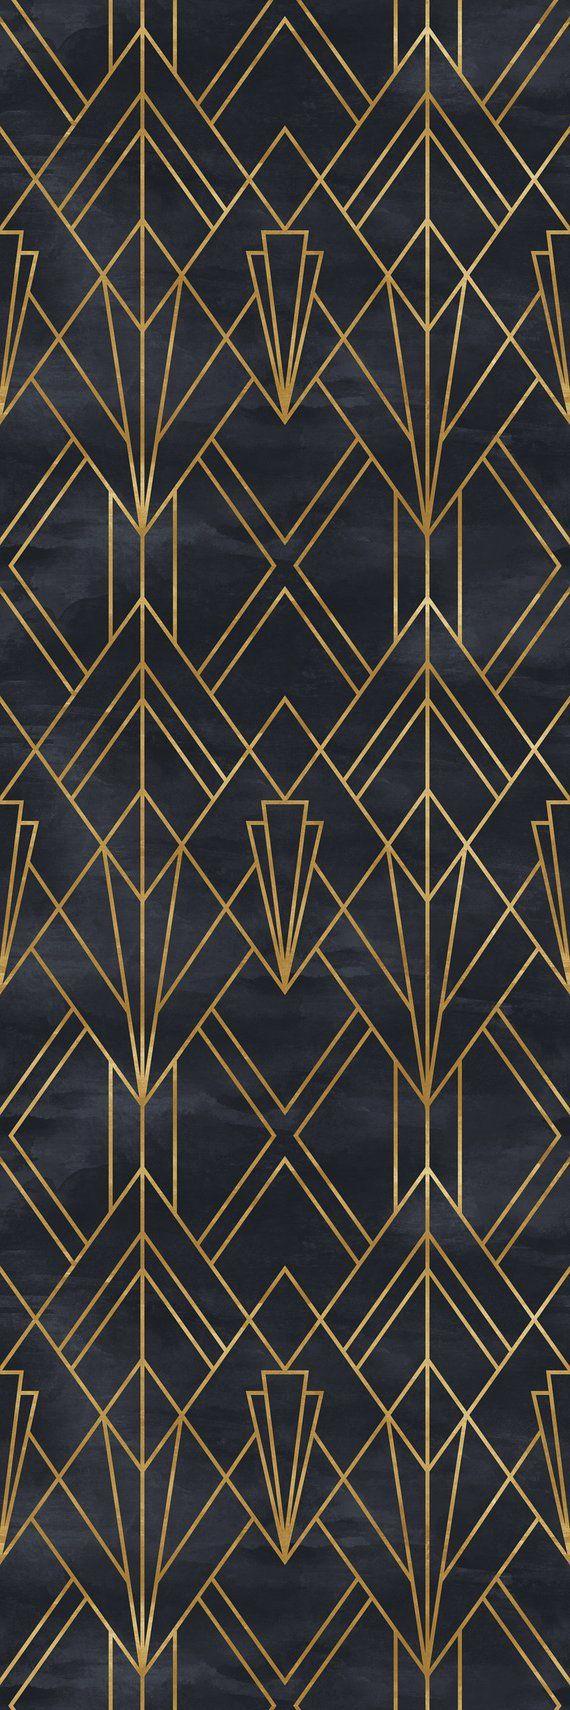 Removable Wallpaper Self Adhesive Wallpaper Gold And Black Geometric Peel Stick Wallpaper Self Adhesive Wallpaper Removable Wallpaper Peel And Stick Wallpaper